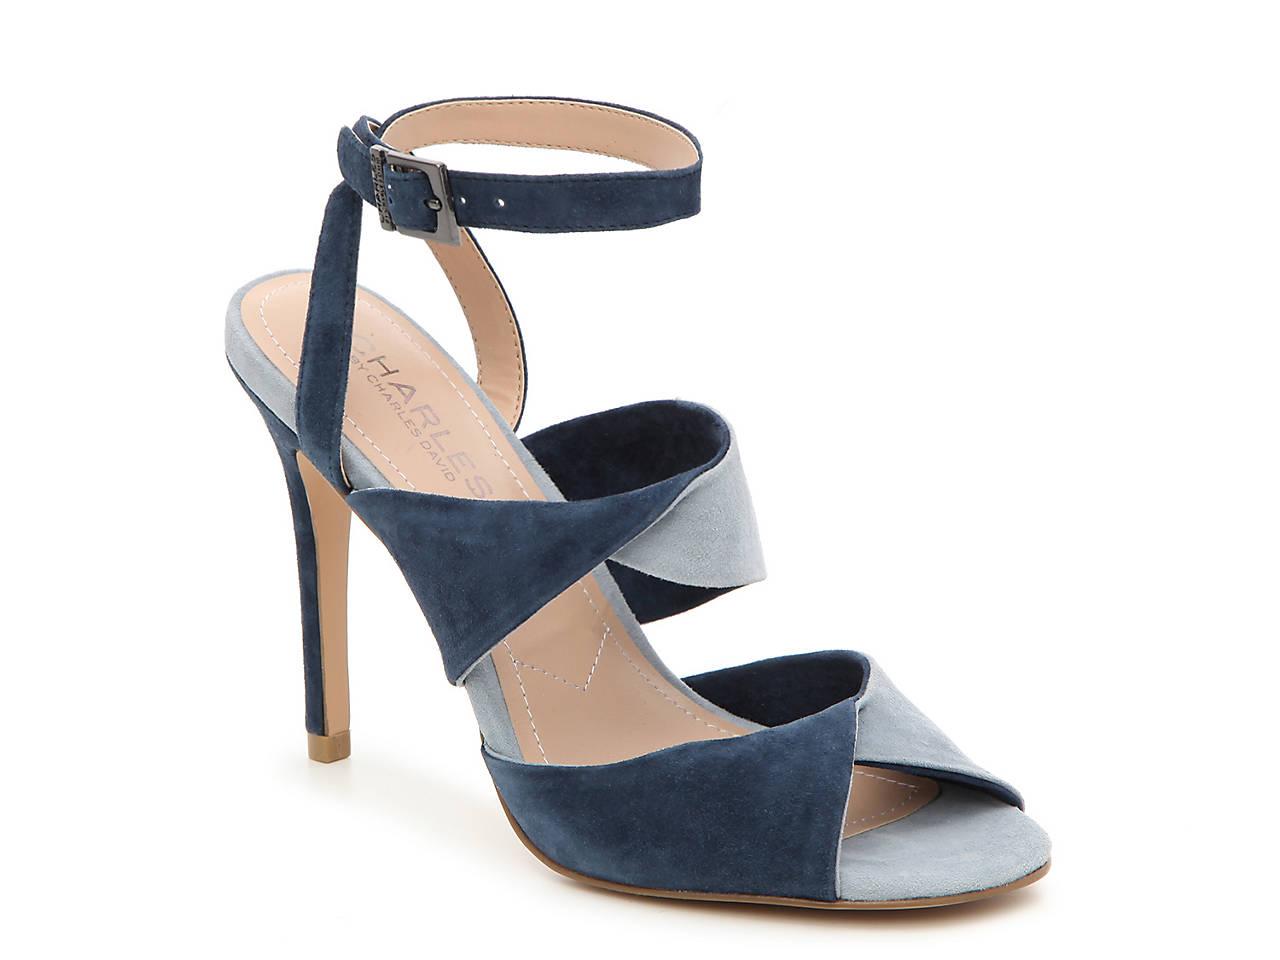 721f9877c Charles by Charles David Radley Sandal Women s Shoes